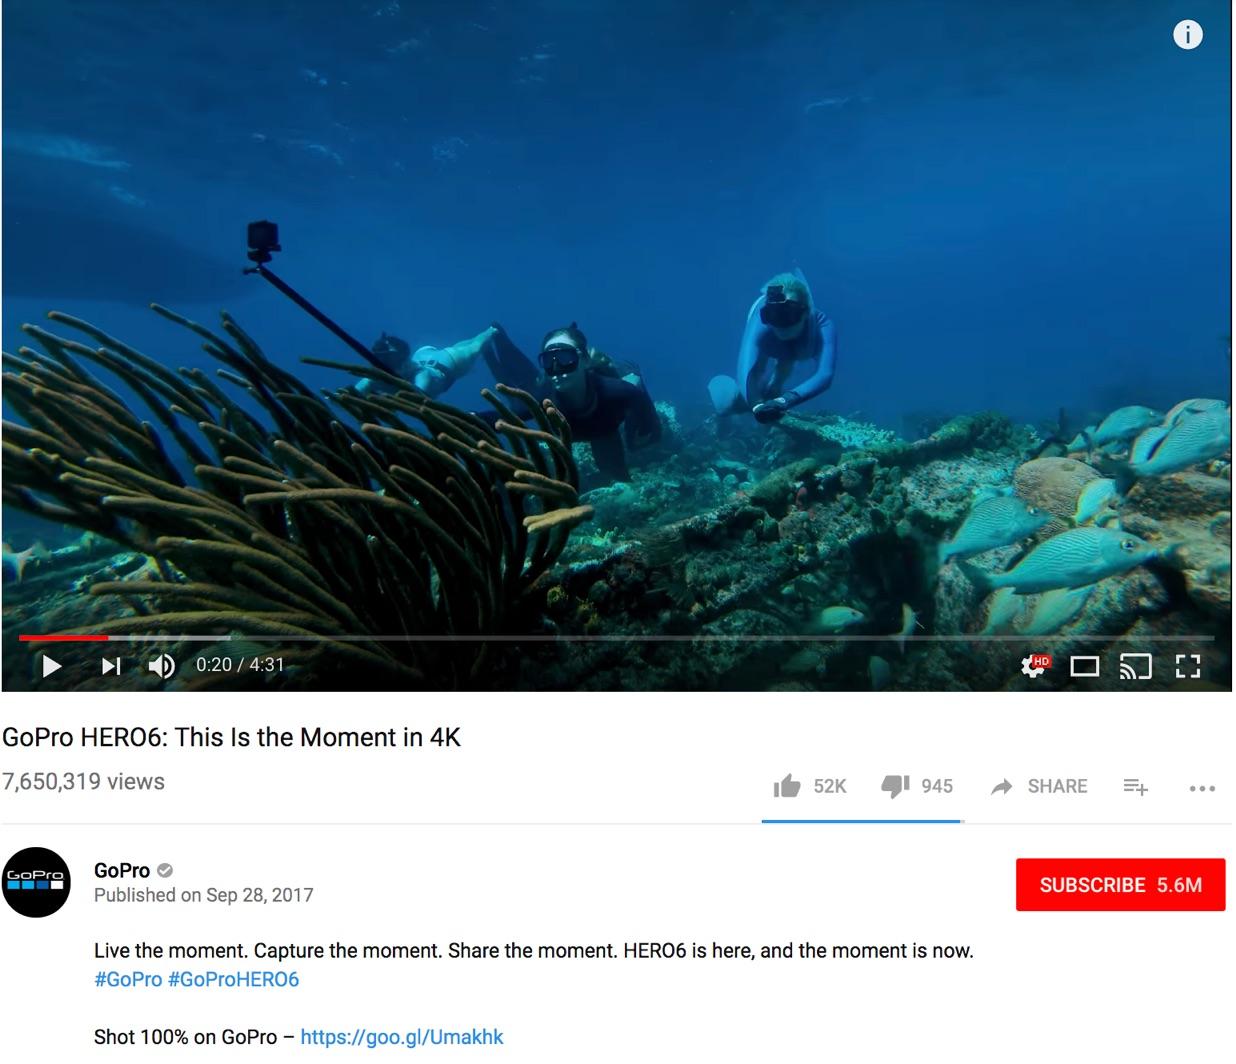 GoPro hero6 YouTube video